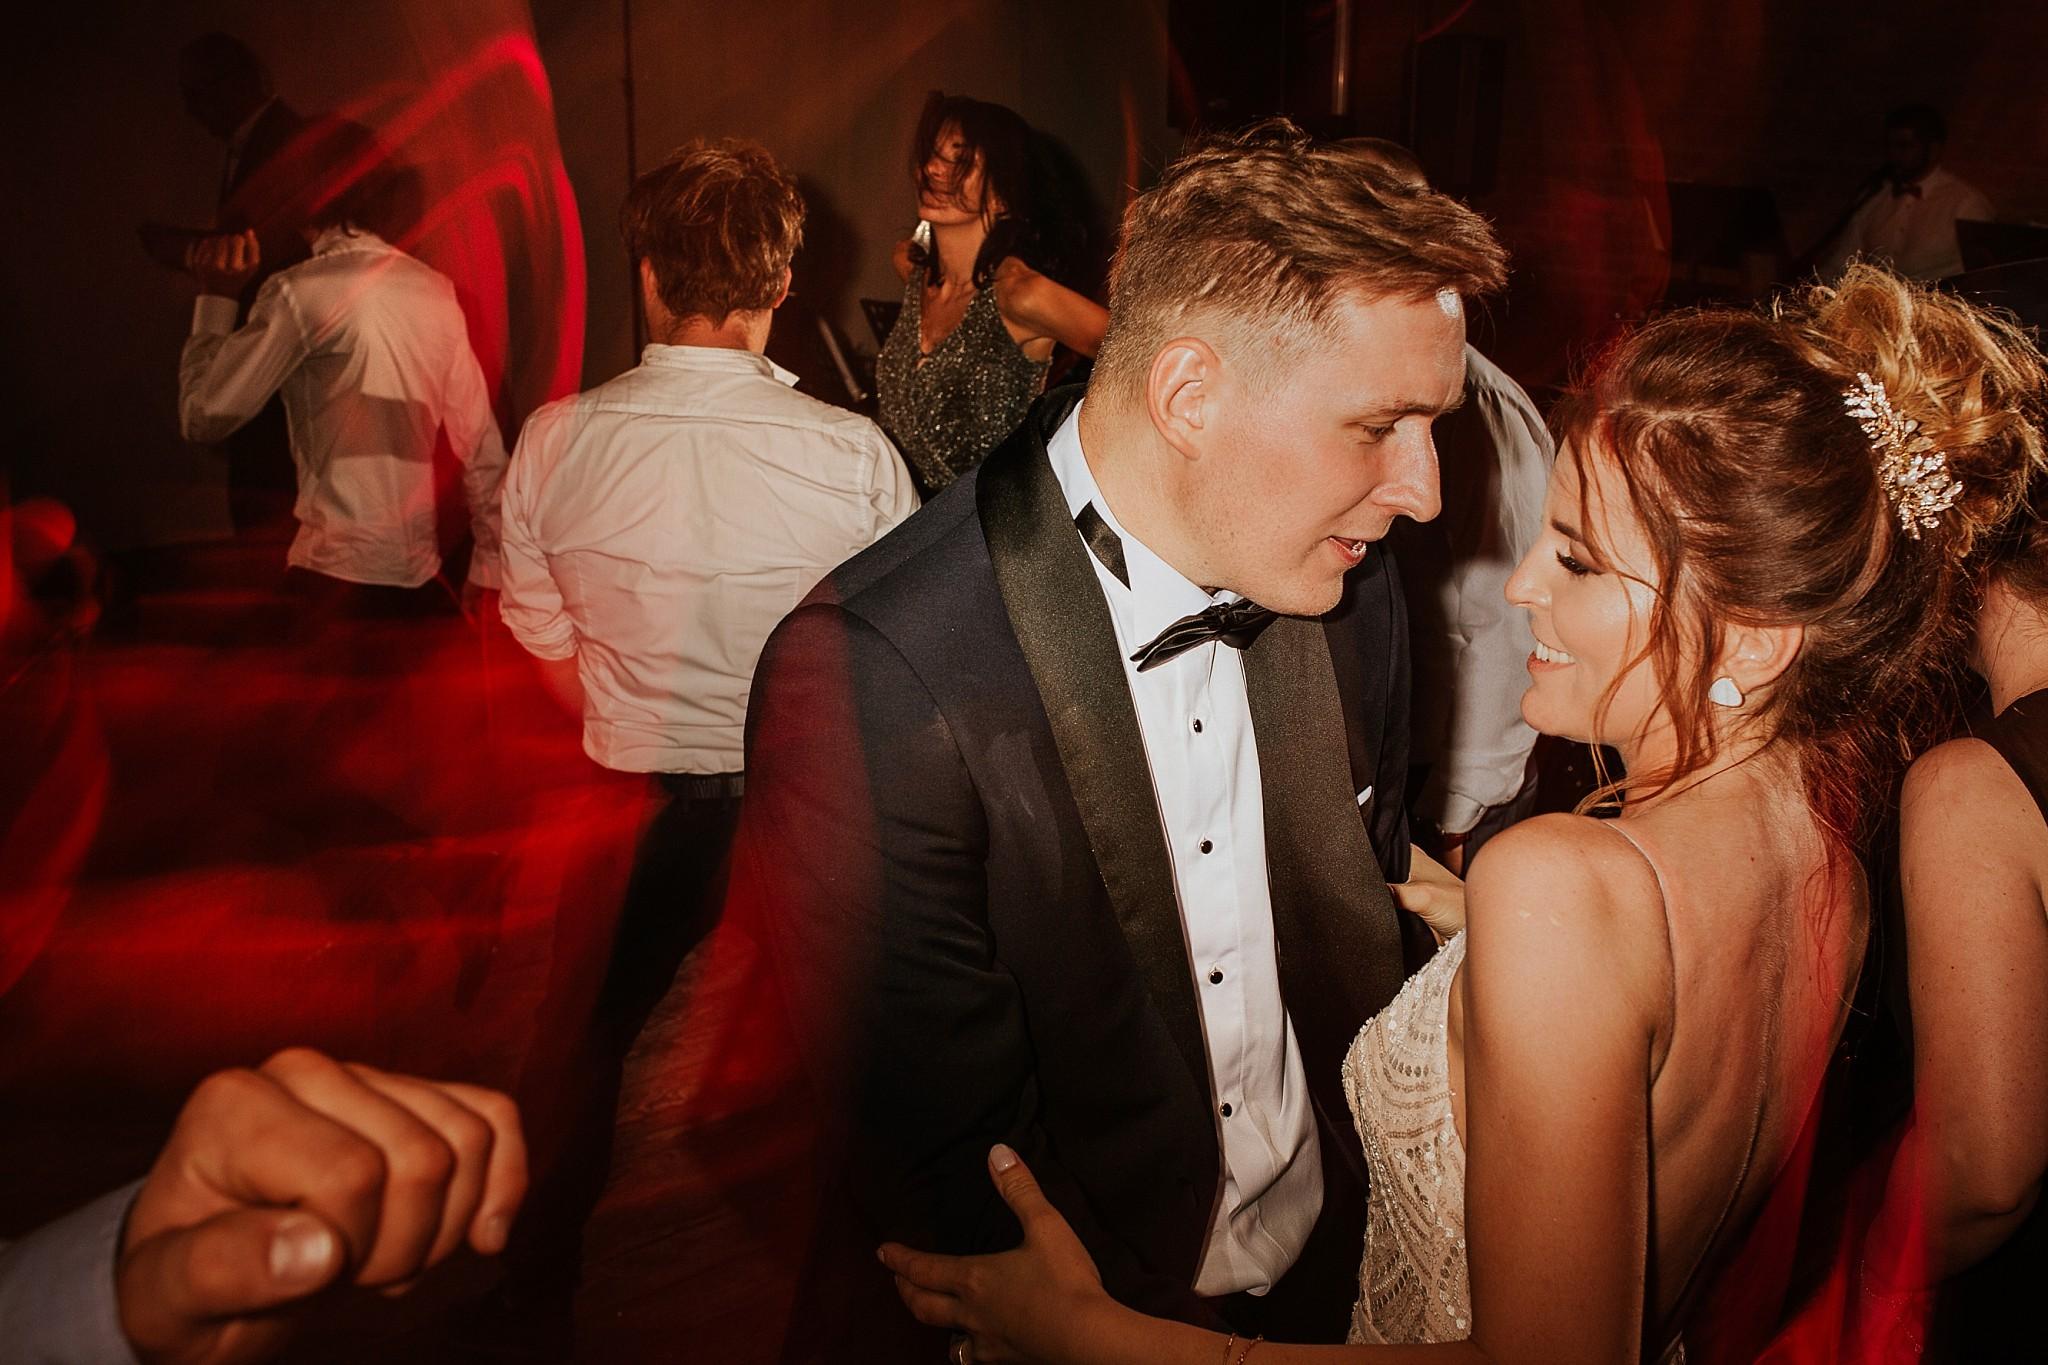 fotograf poznan wesele dobra truskawka piekne wesele pod poznaniem wesele w dobrej truskawce piekna para mloda slub marzen slub koronawirus slub listopad wesele koronawirus 442